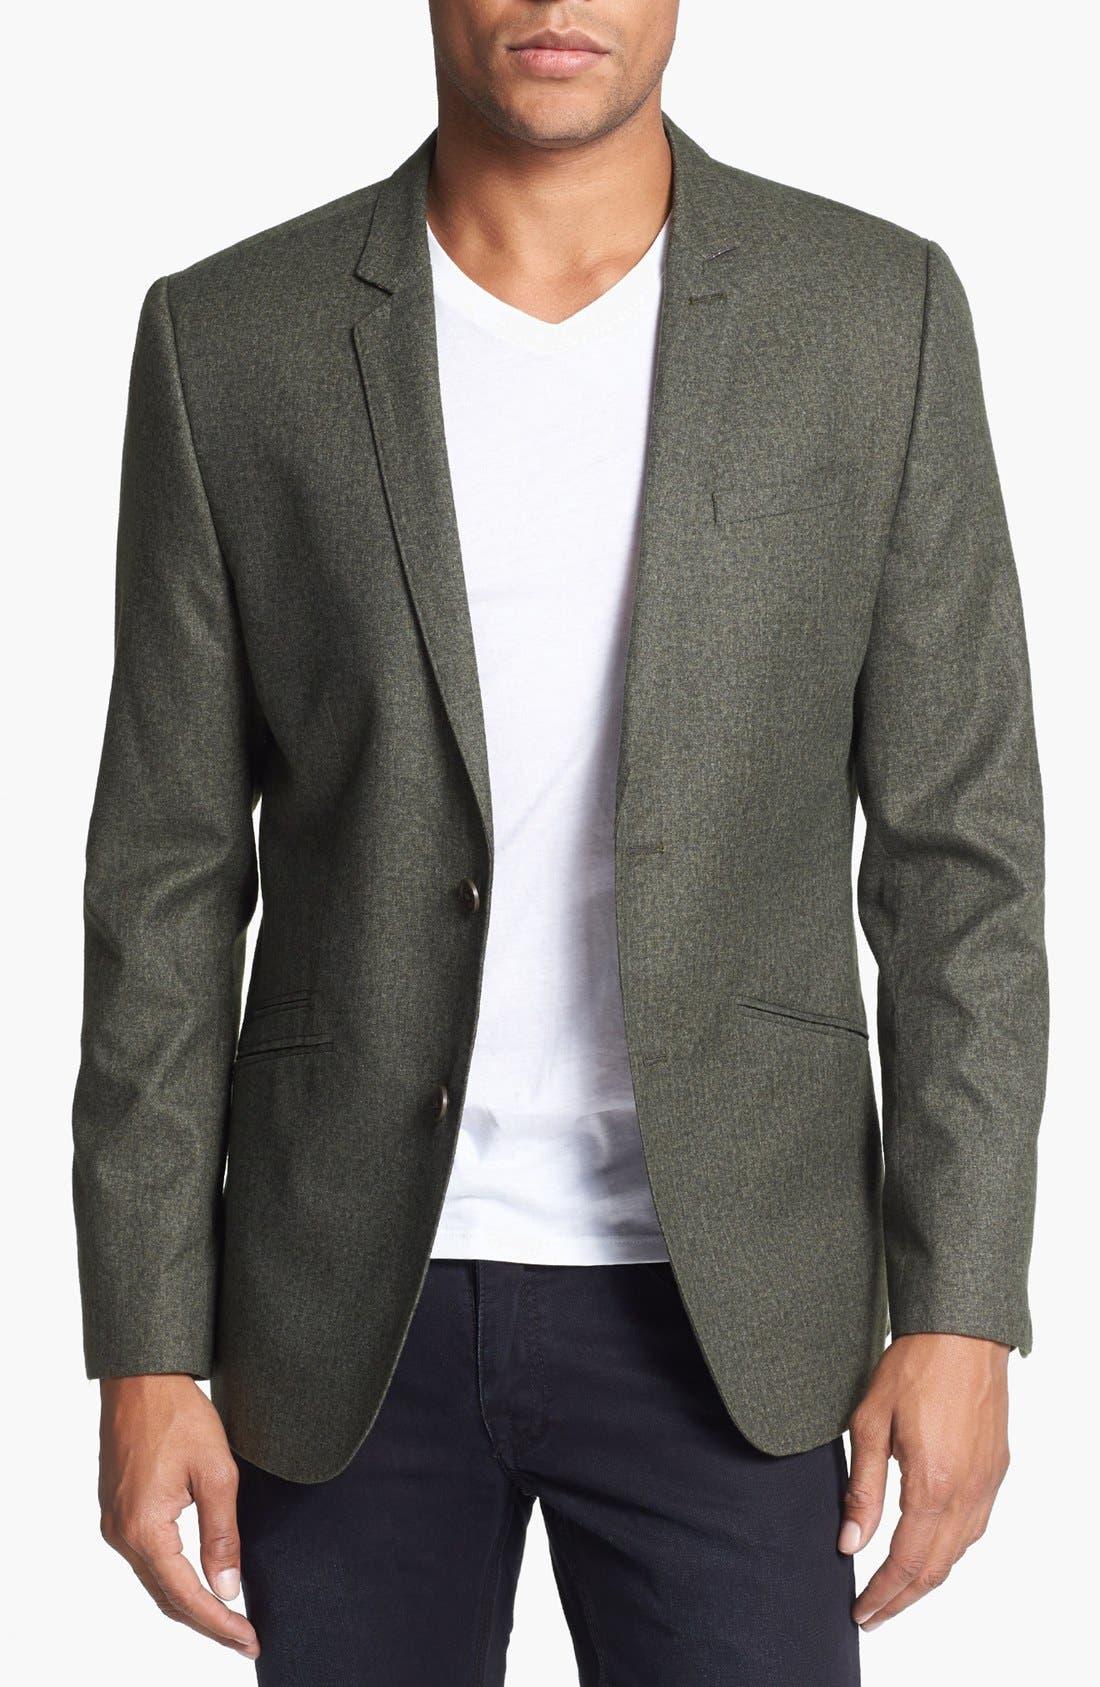 t shirt under sport coat